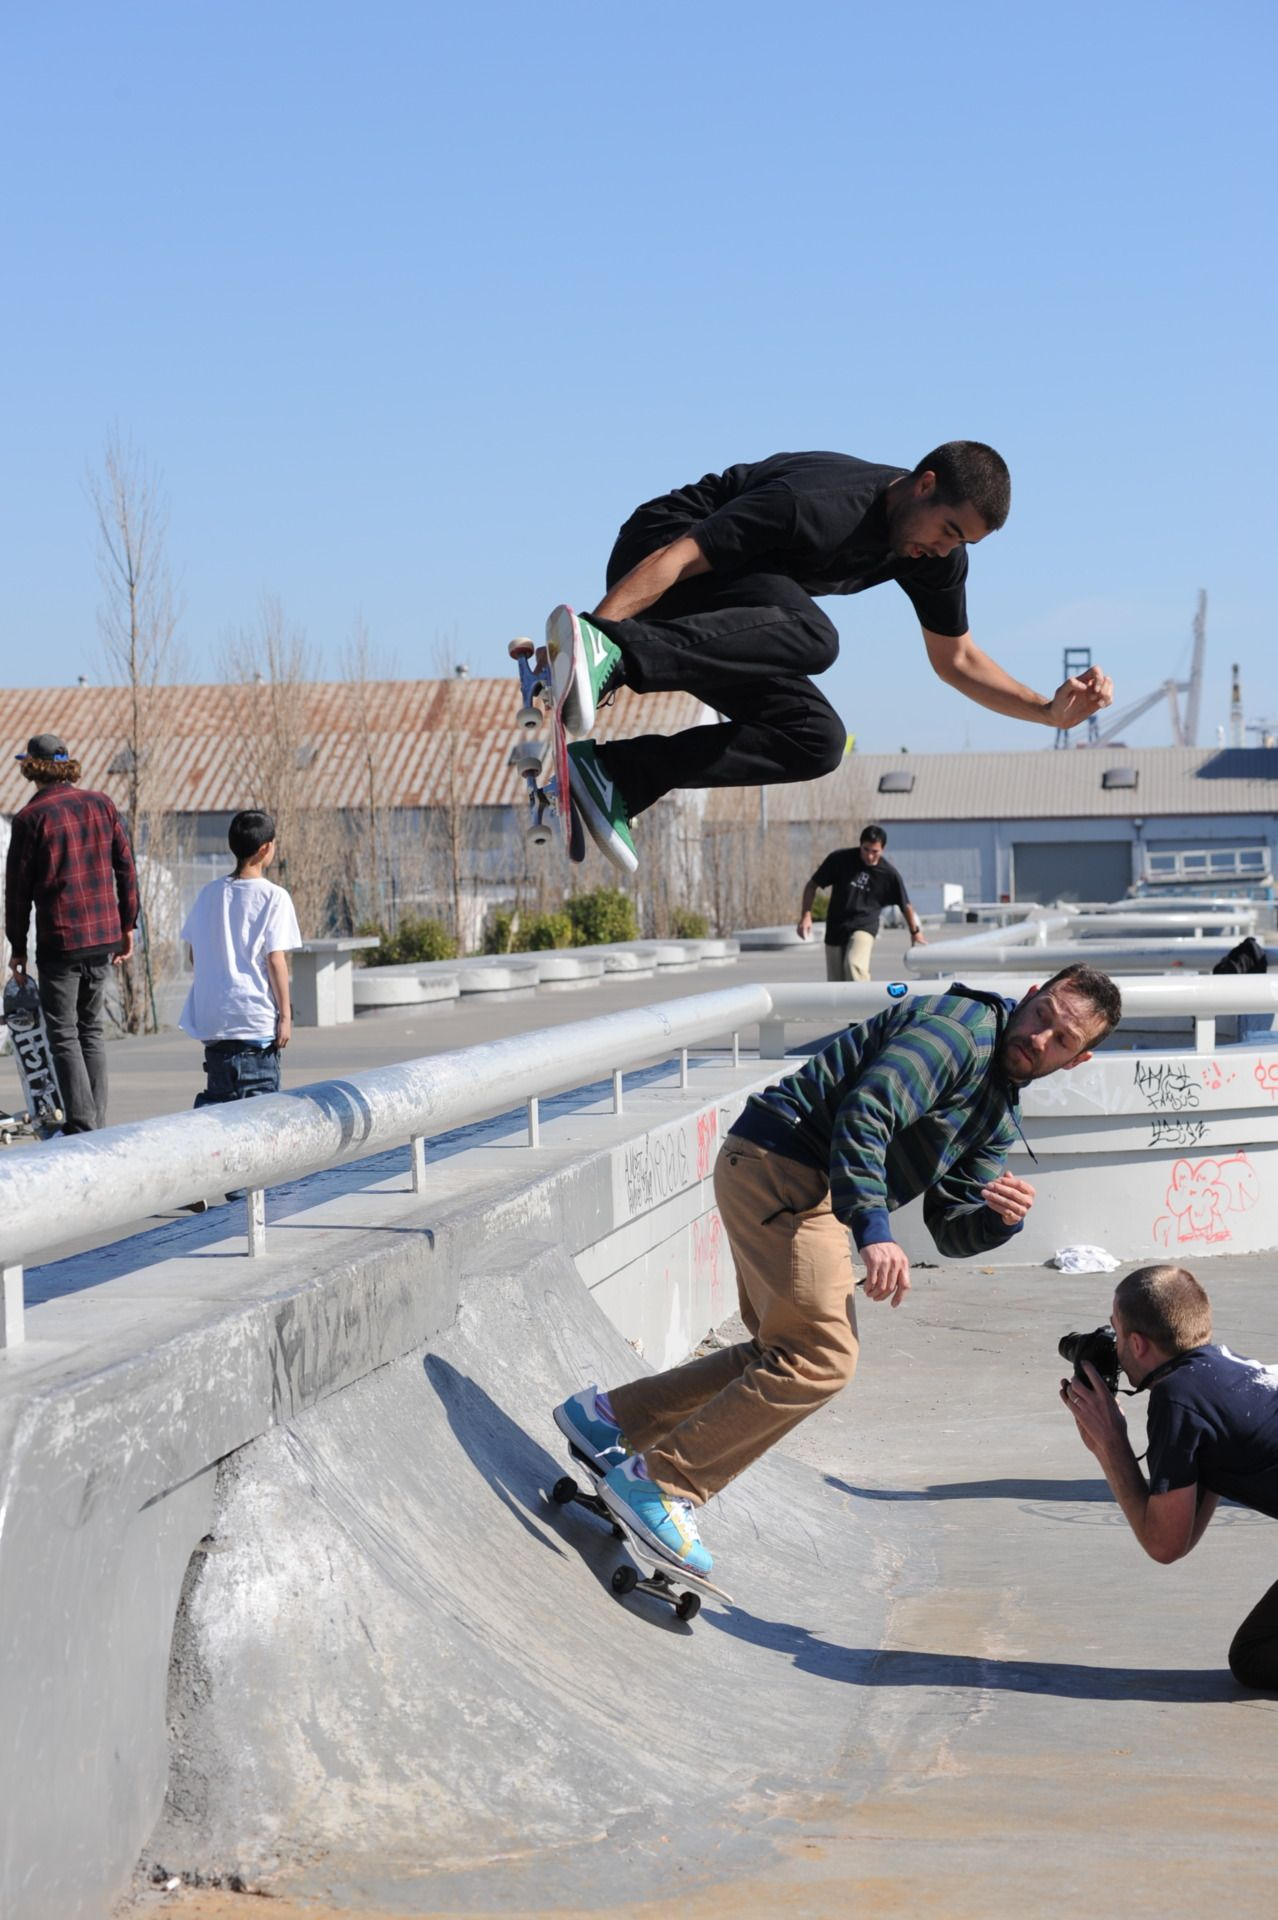 Www Nakalada Tumblr Com Eric Koston Skateboard Pictures Skateboard